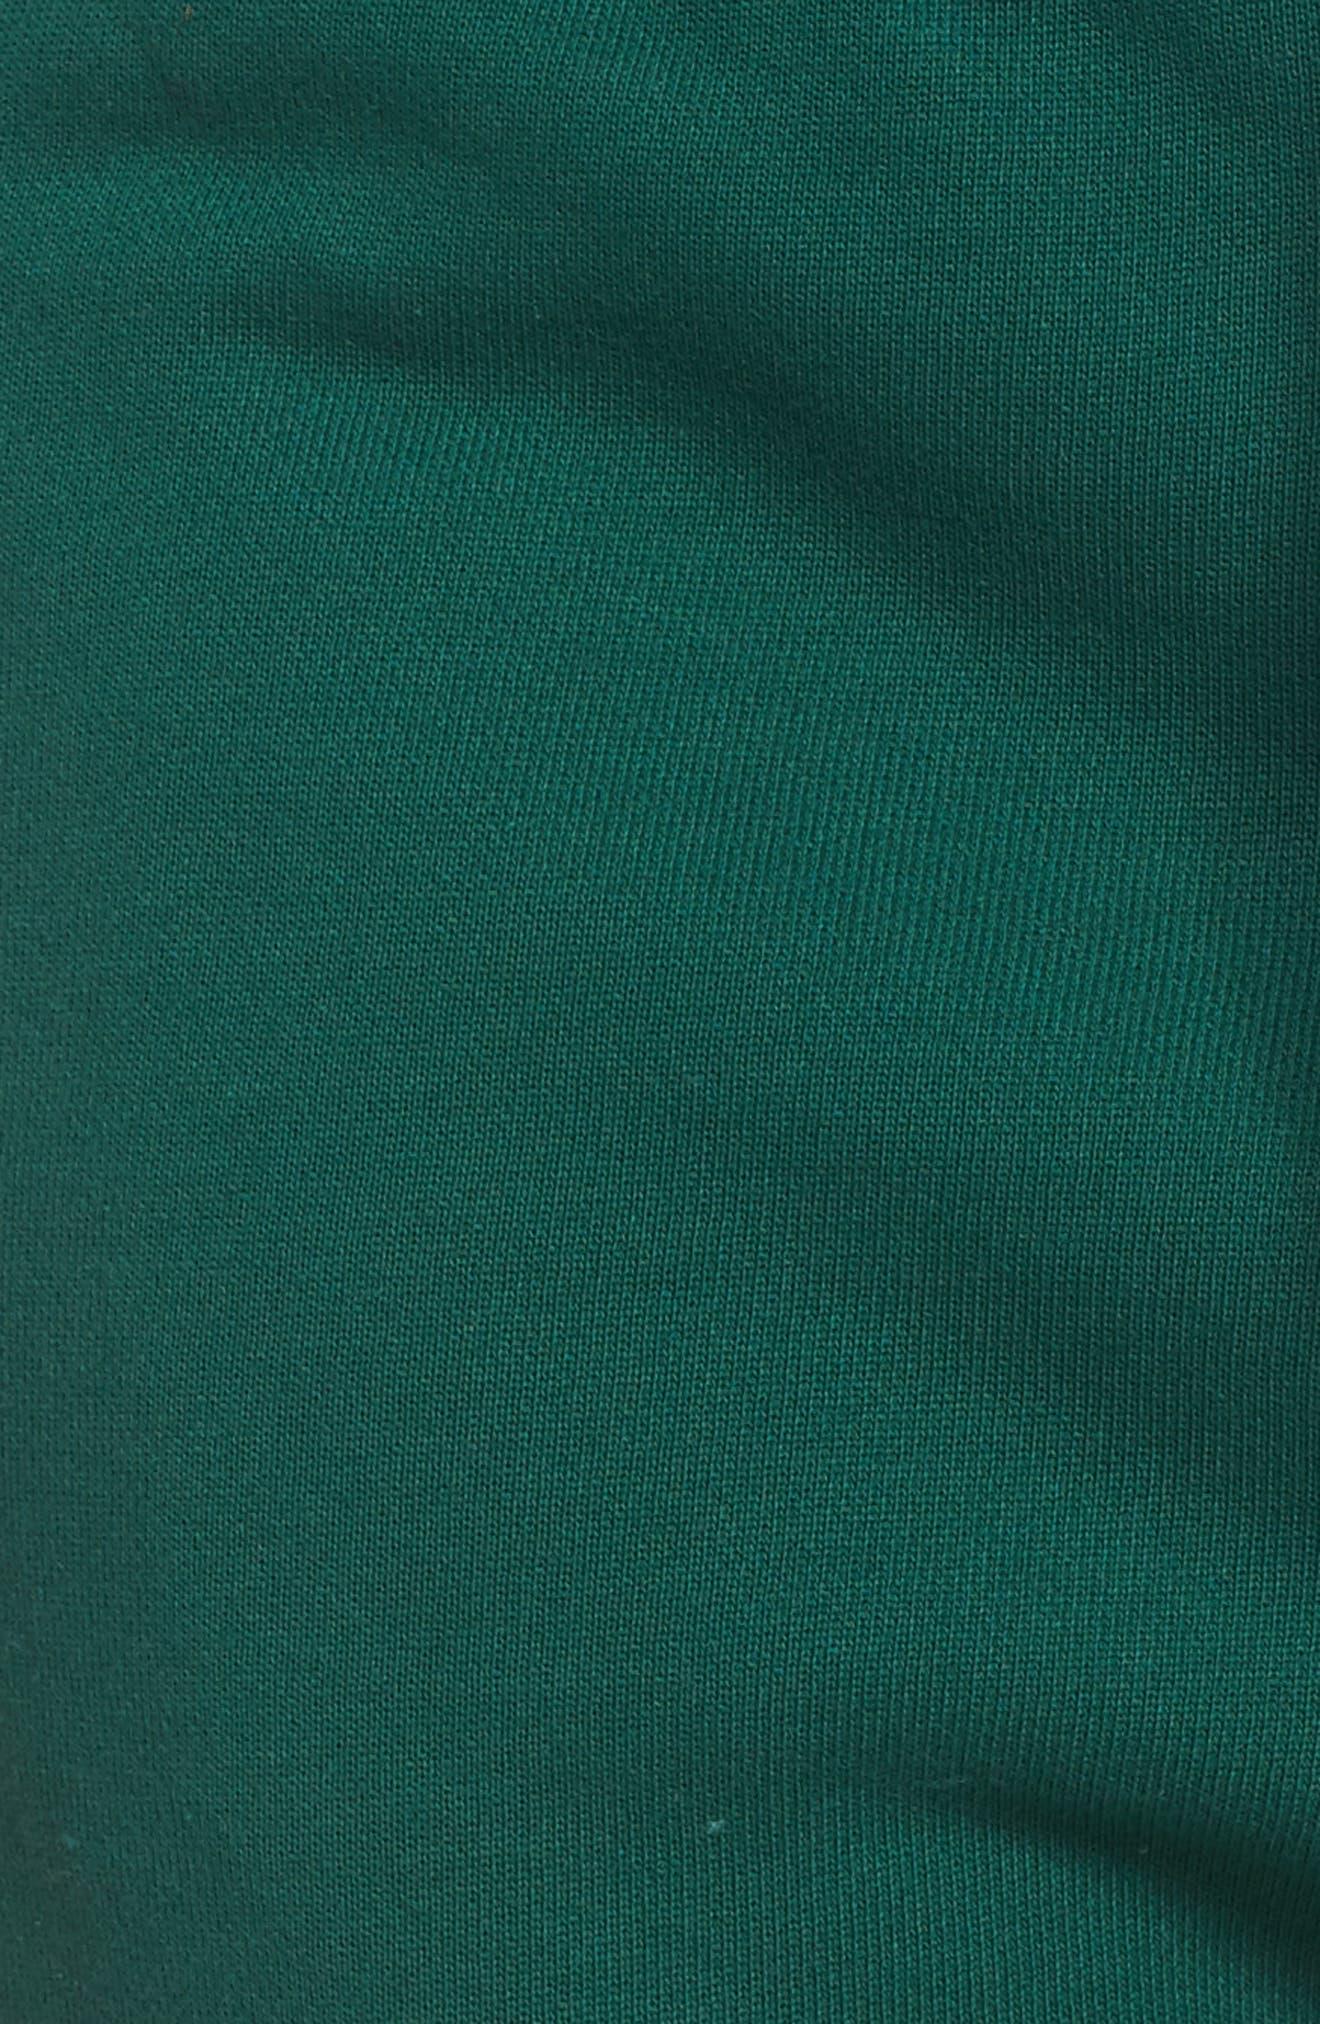 ADIDAS ORIGINALS, Cuffed Track Pants, Alternate thumbnail 6, color, 305